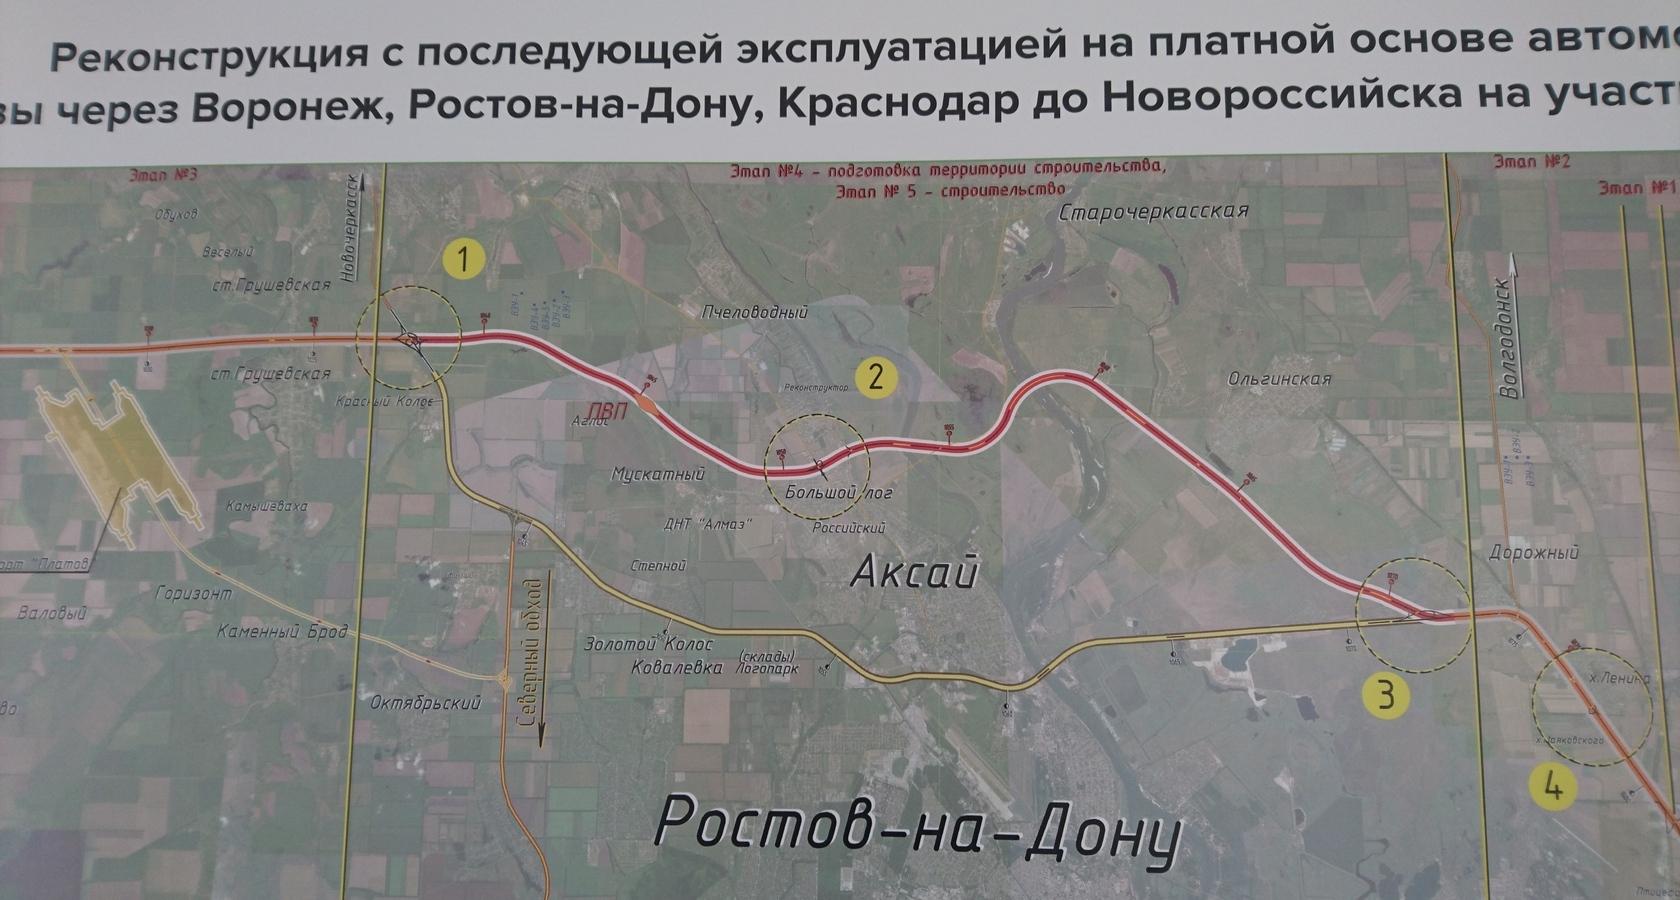 Схема нового обхода г. Аксай на трассе М-4 (фото: ГиД)